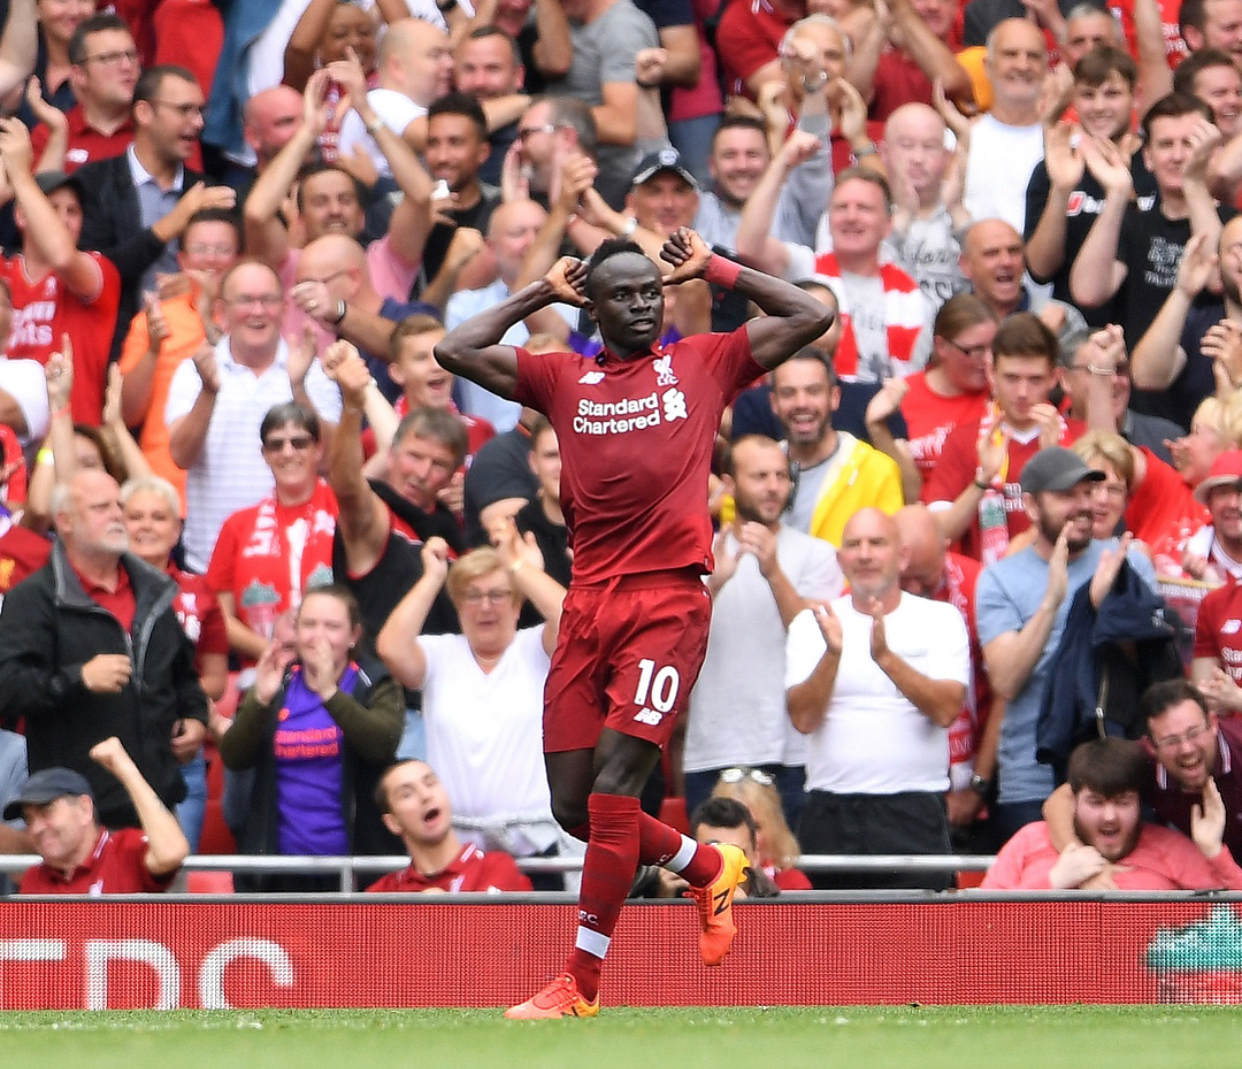 Angleterre : Sadio Mané  élu joueur du mois d'août